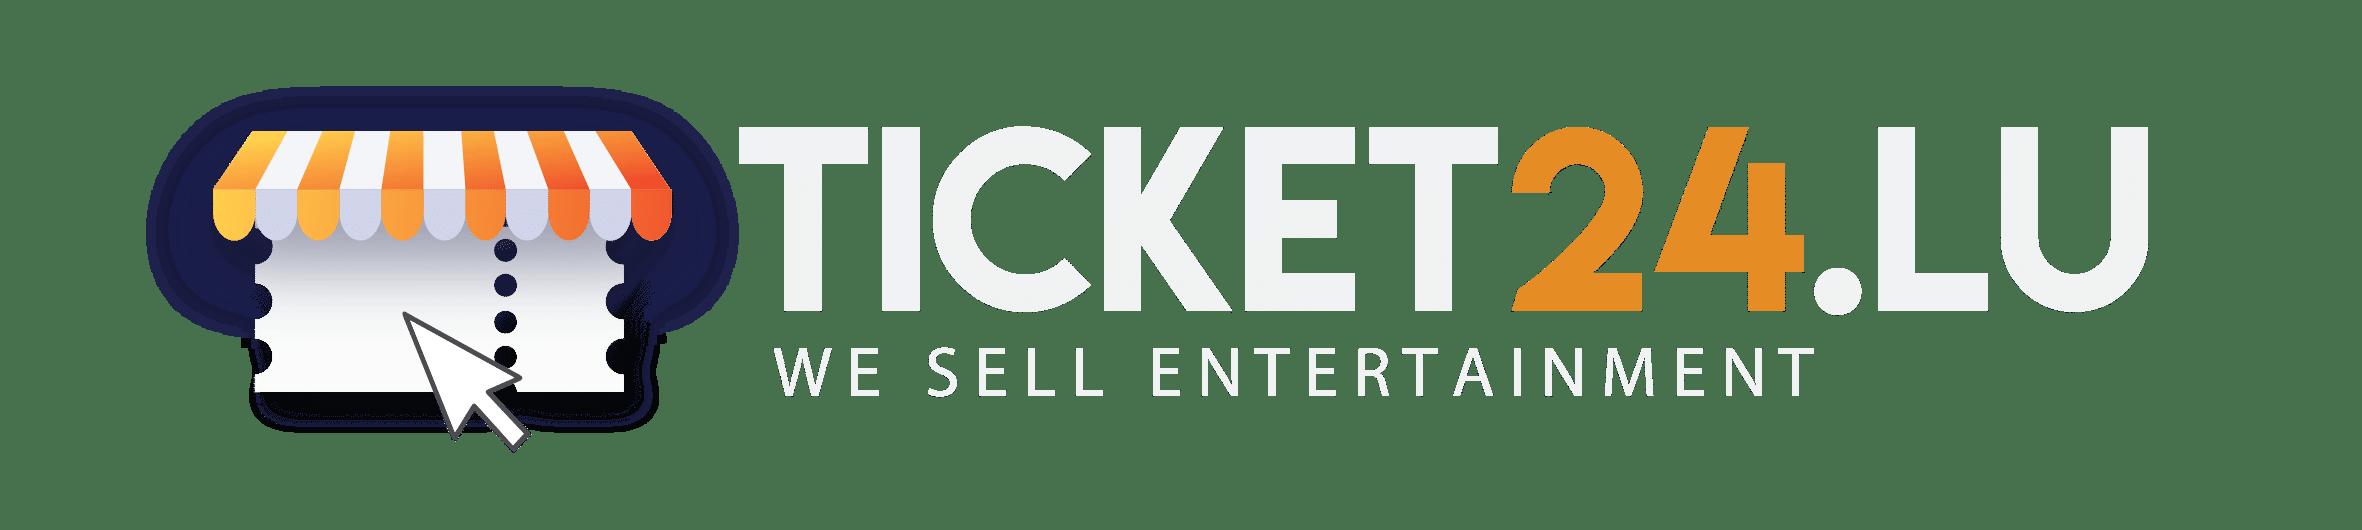 Ticket24.lu